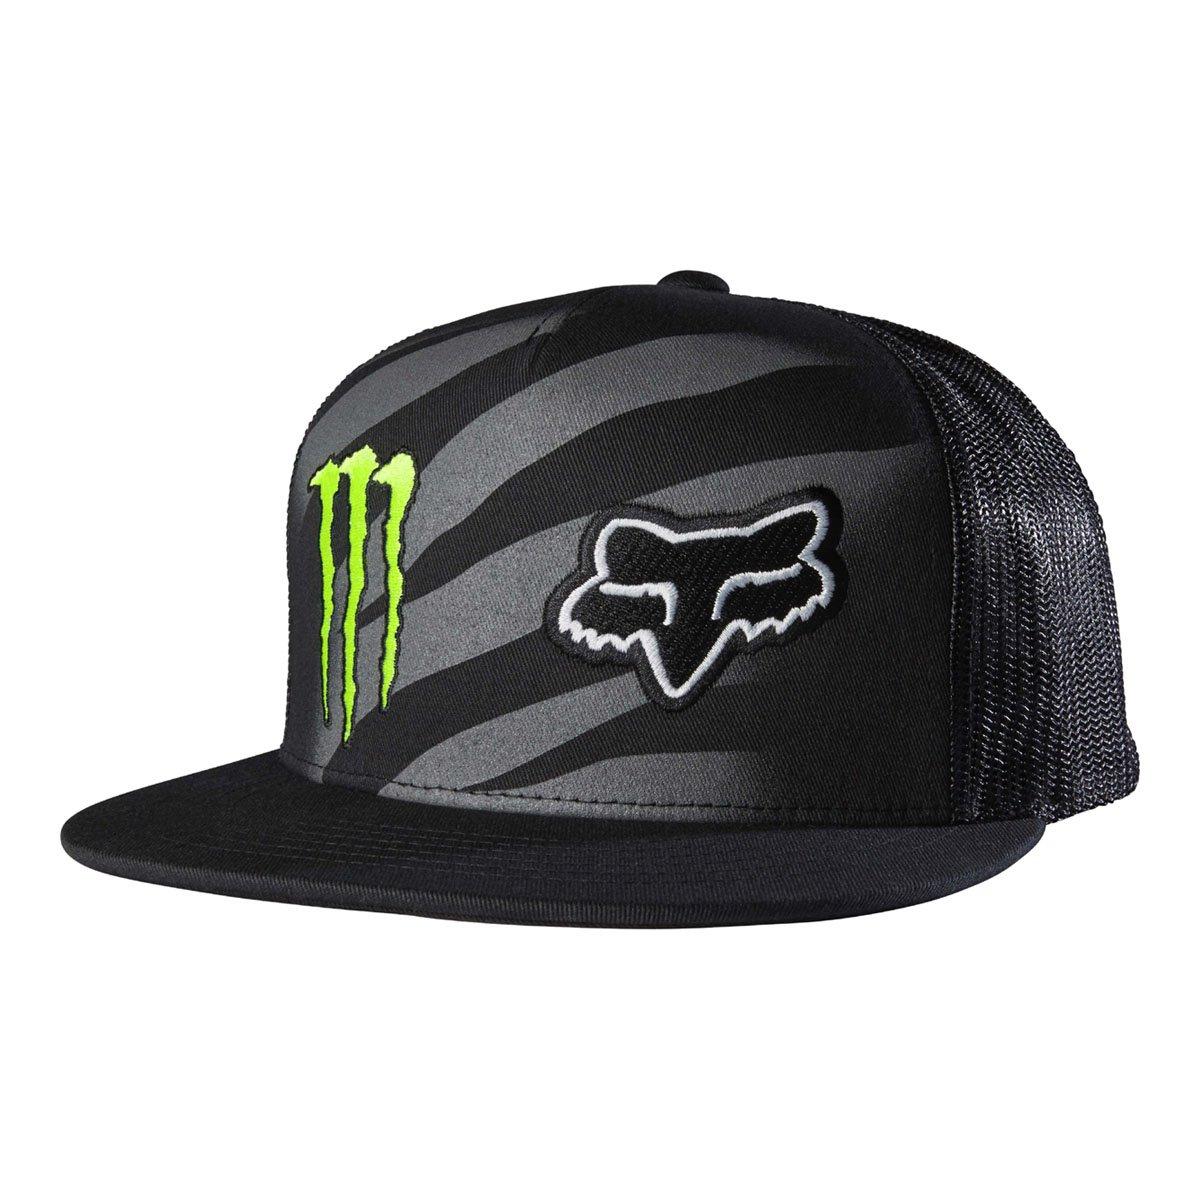 Amazon.com  Fox Racing Mens Monster Zebra Snapback Adjustable Hat One Size  Black  Sports   Outdoors ff1743ad09e6